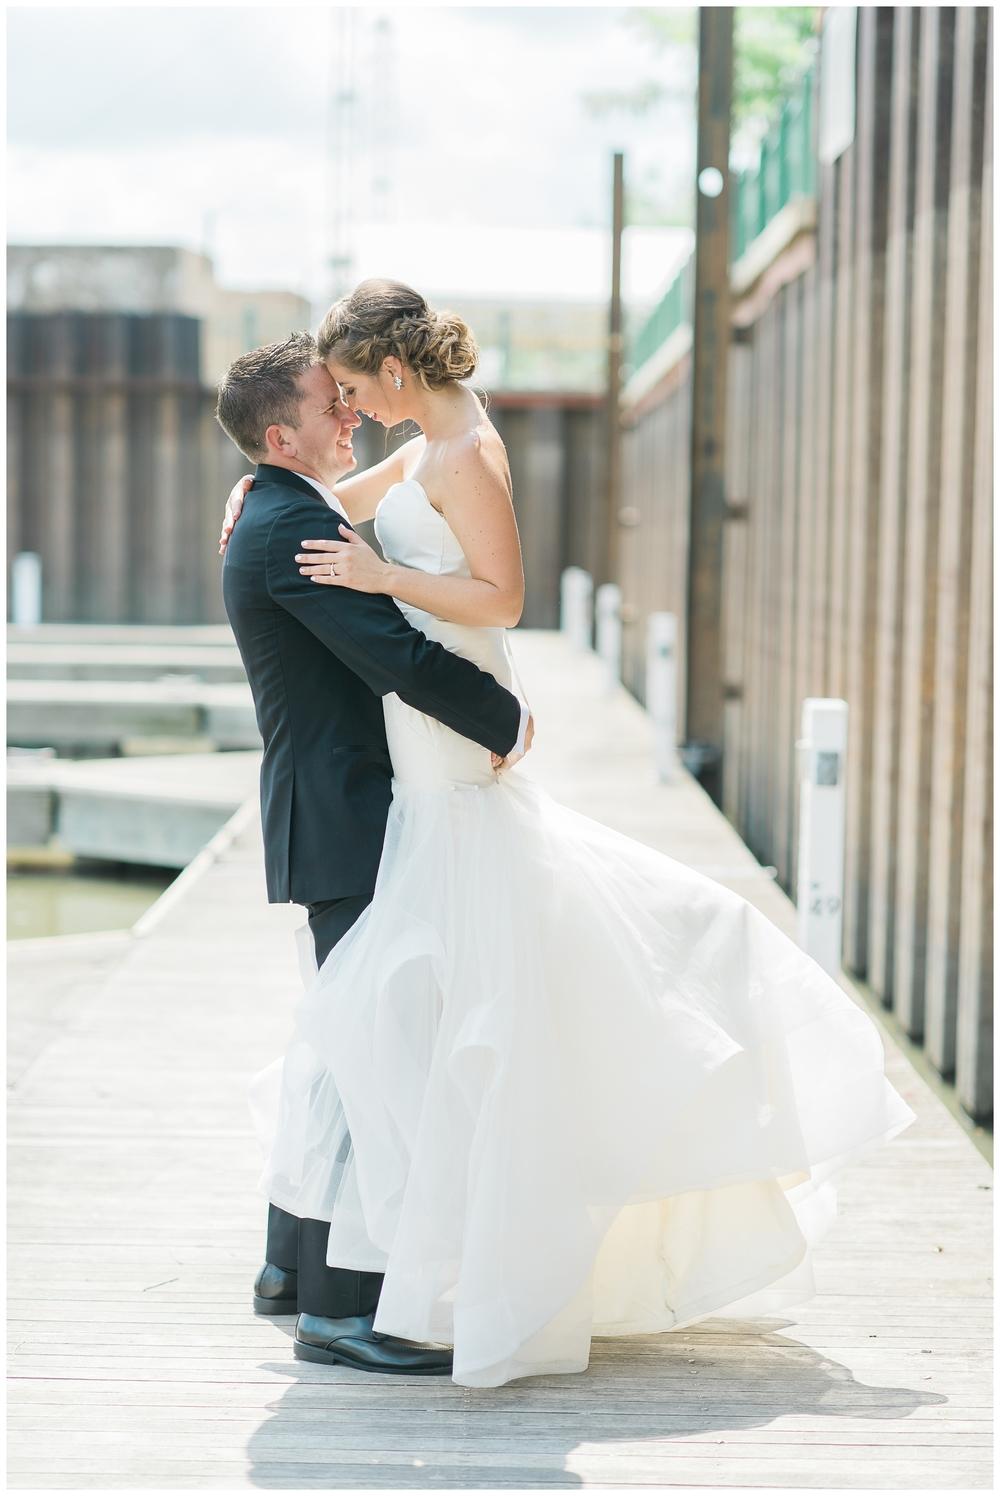 Rebecca_Bridges_Photography_Indianapolis_Wedding_Photographer_5050.jpg